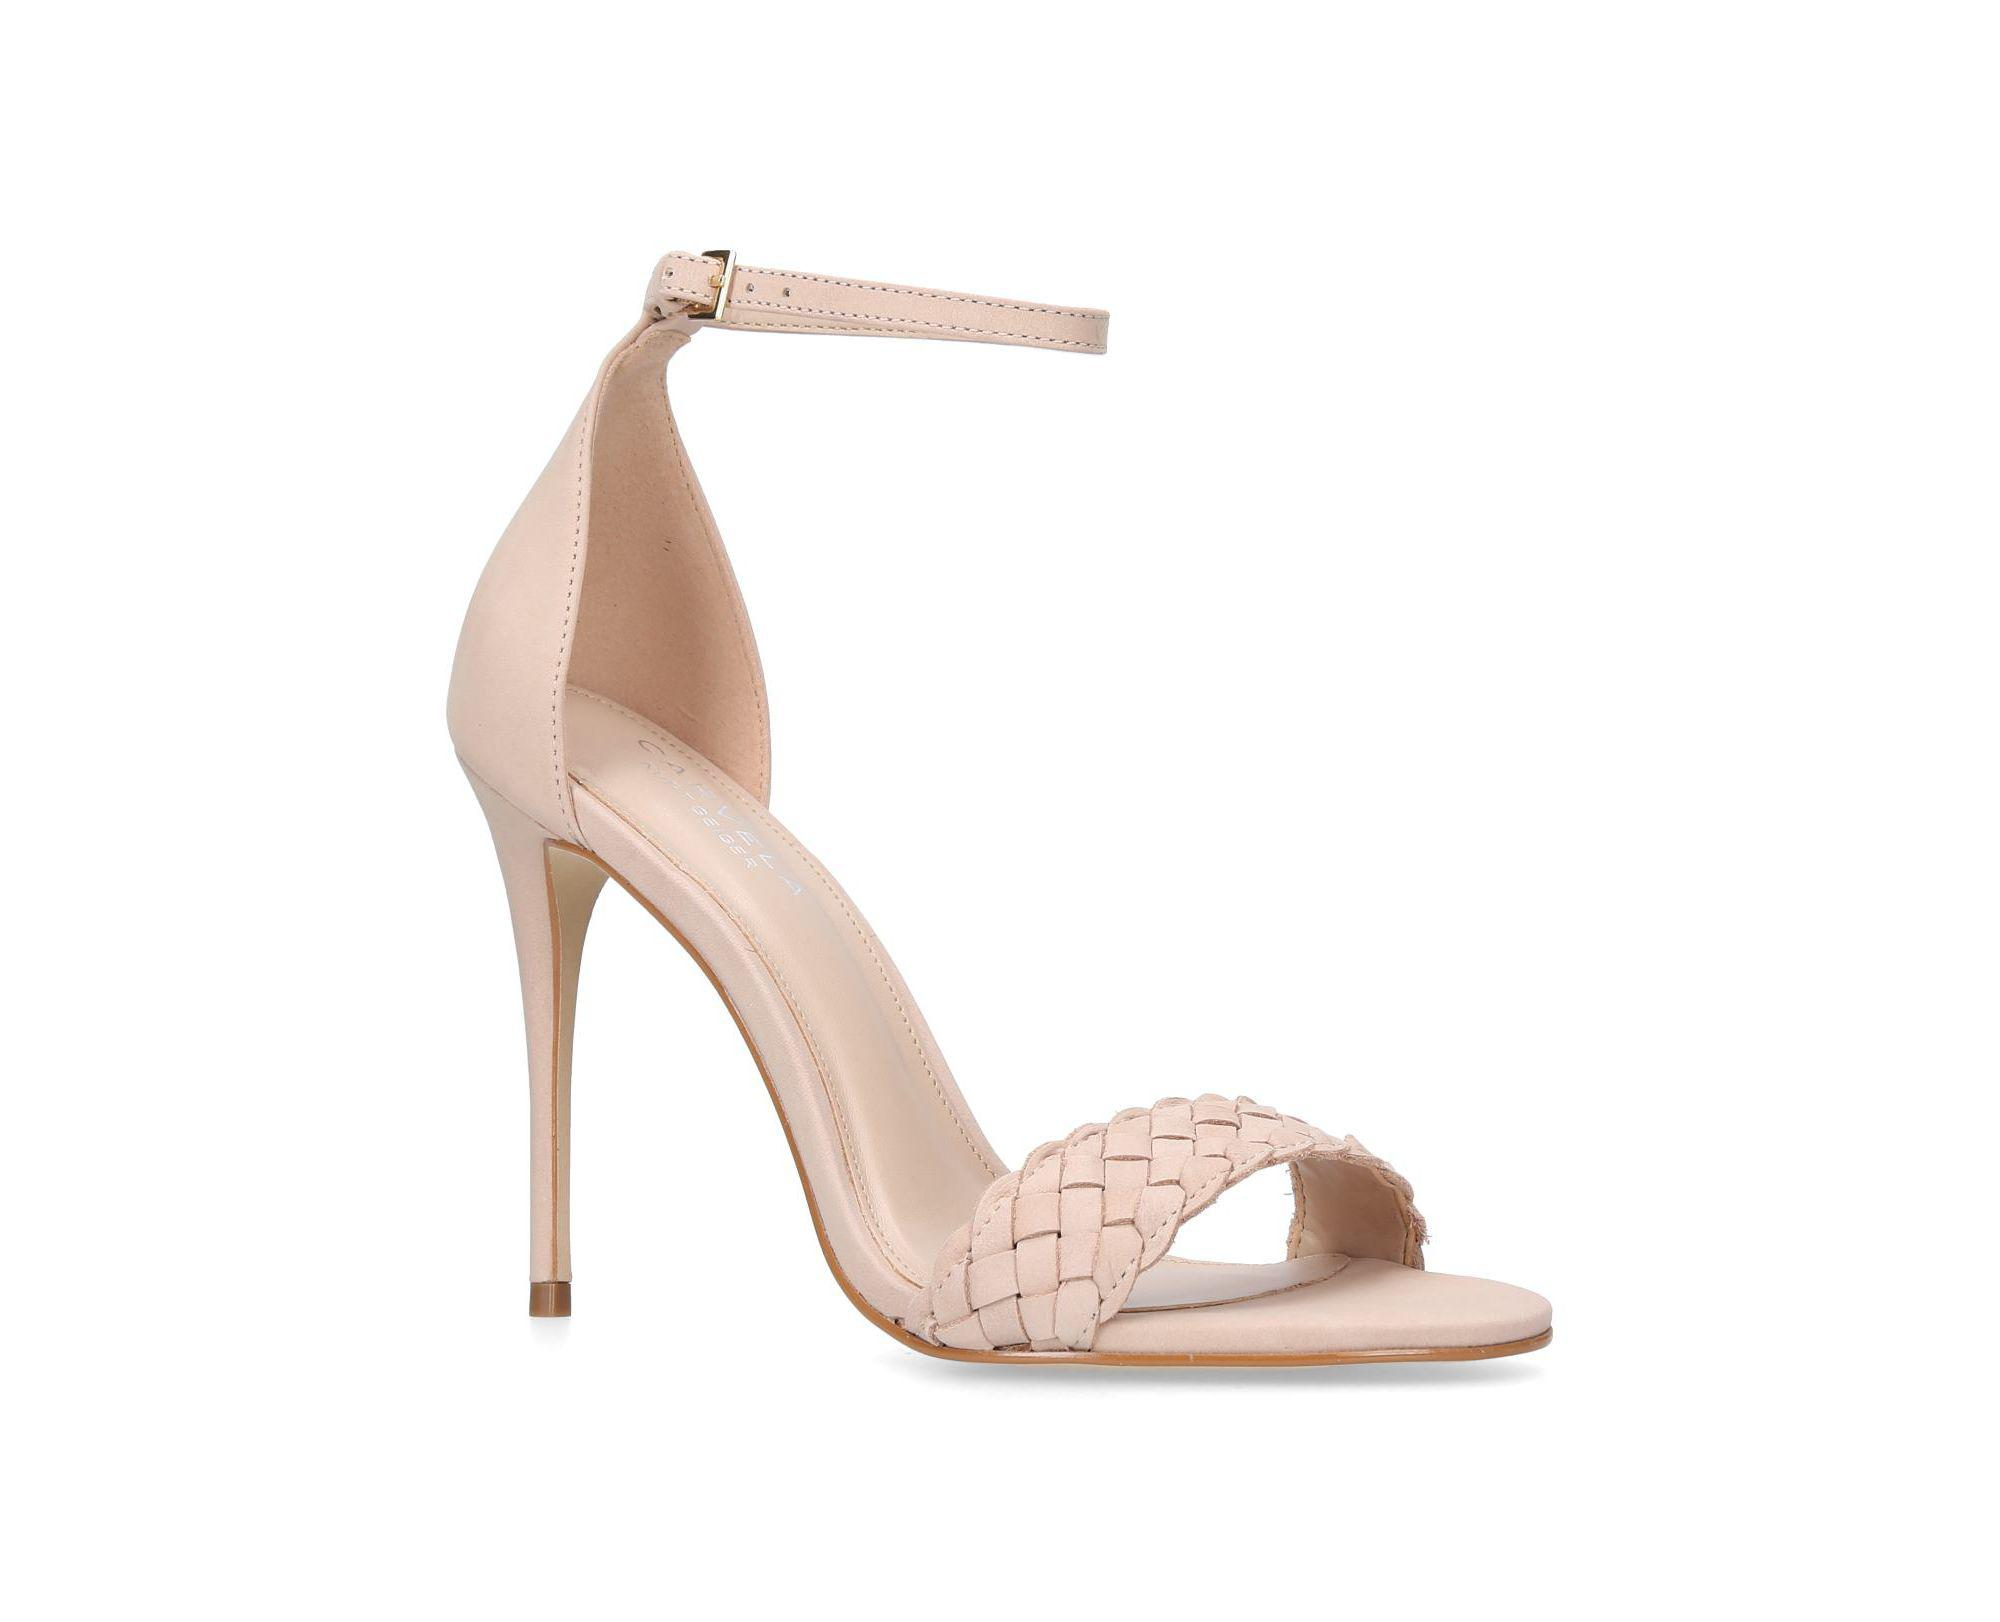 4dfd4a7ea261 Carvela Kurt Geiger Nude  glimpse  Ankle Strap Sandals in Brown - Lyst